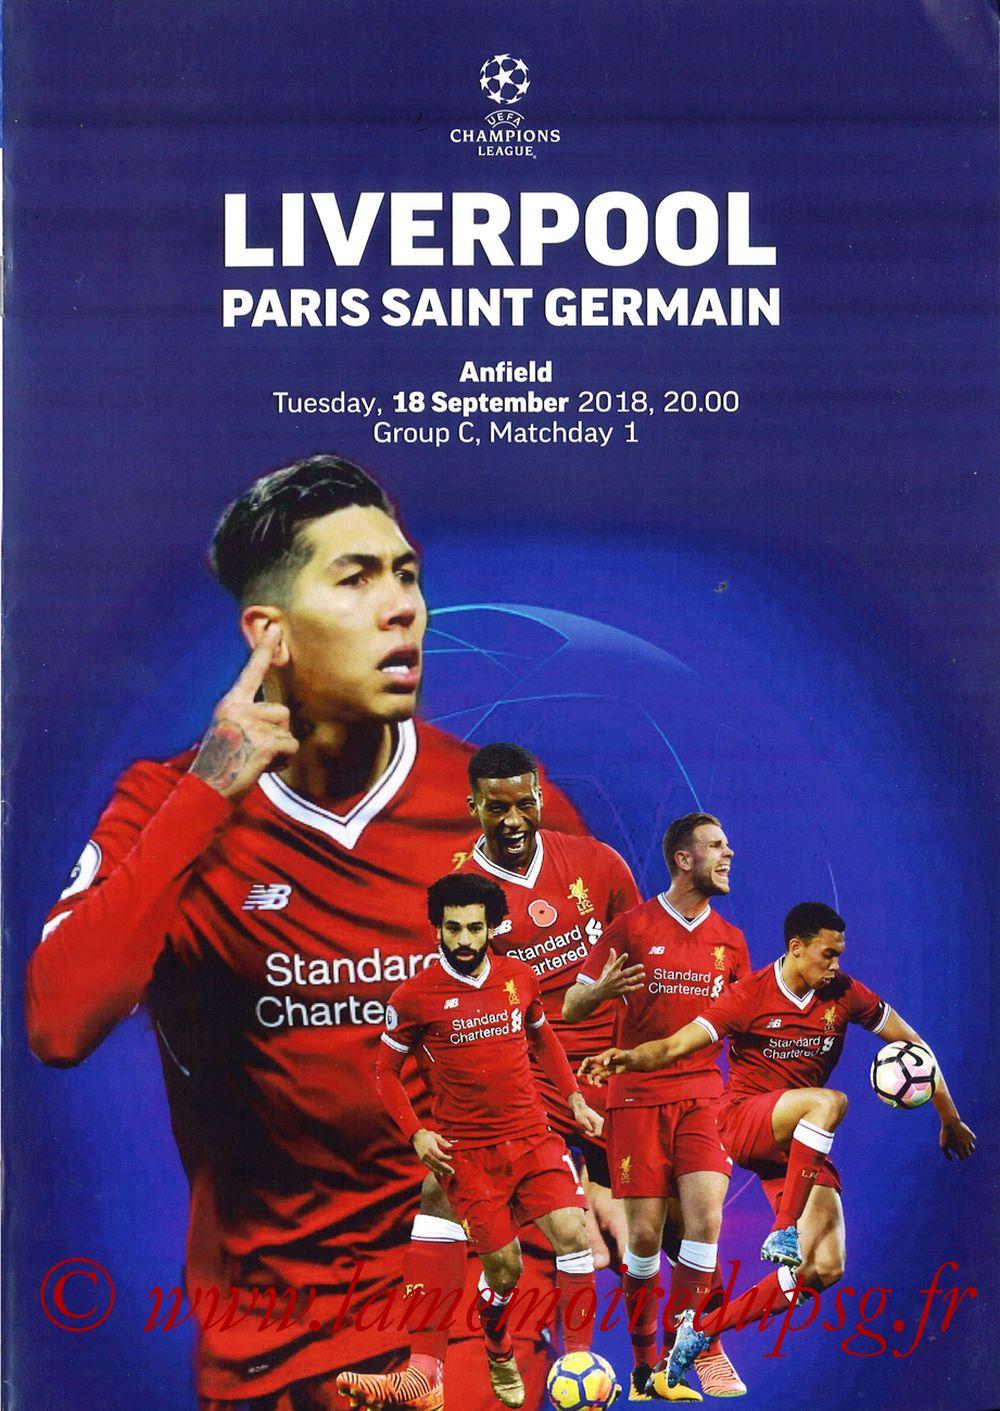 2018-09-18  Liverpool-PSG (1ère C1, Programme pirate)